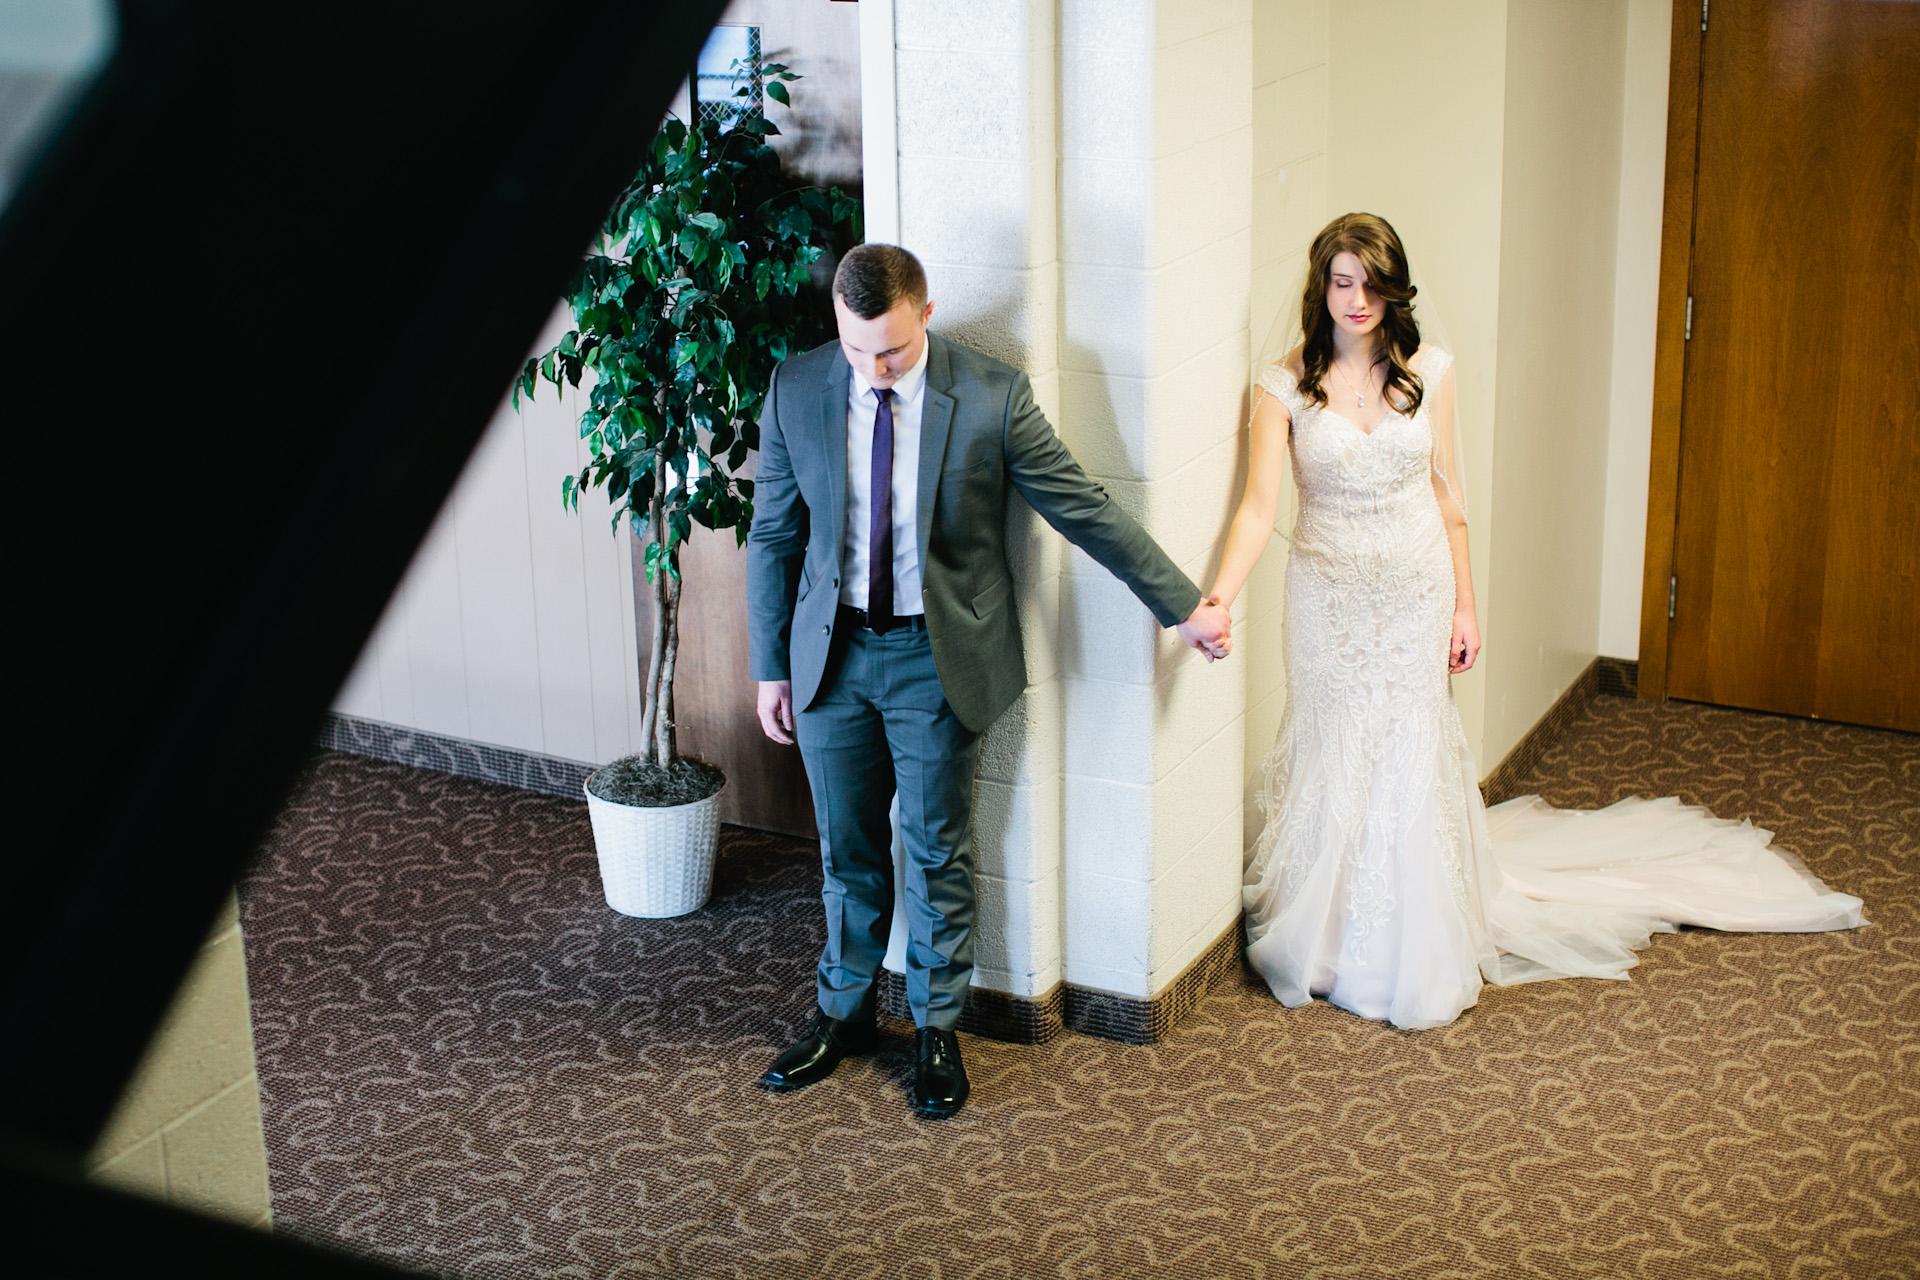 photo-of-couple-praying-together-before-wedding